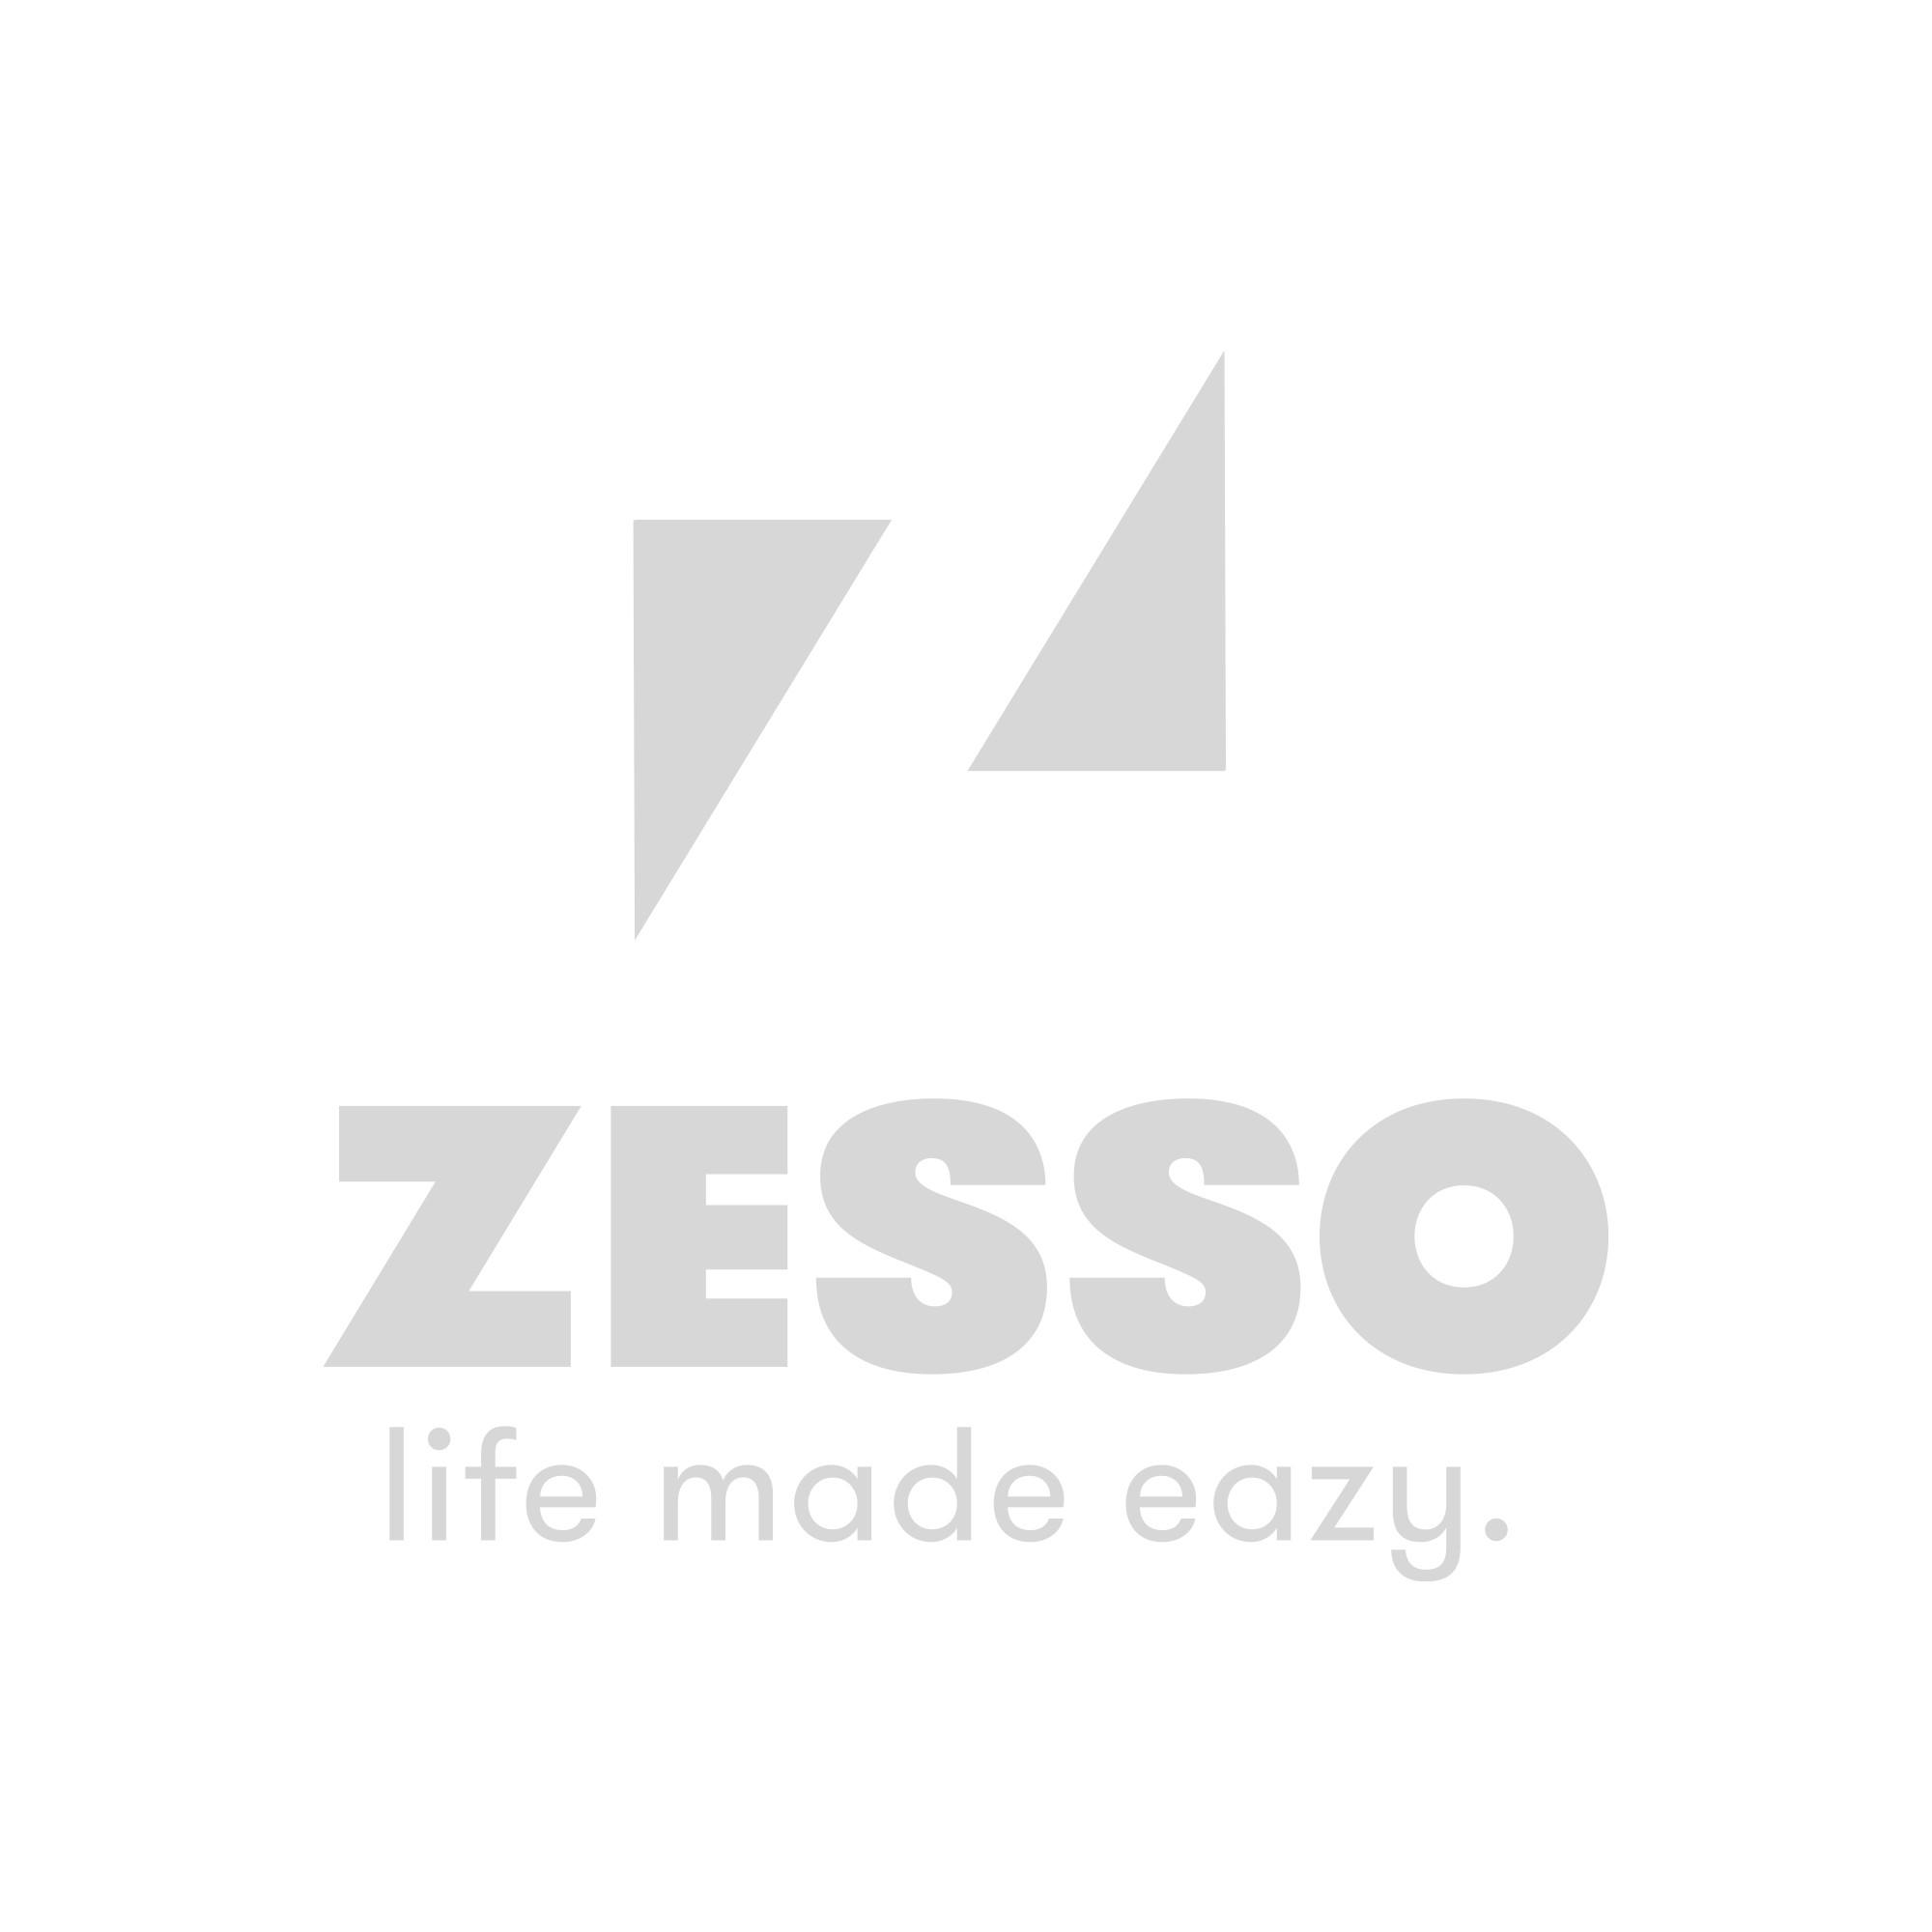 Bobux Babyslofjes Soft Soles Zebra Grijs – Small